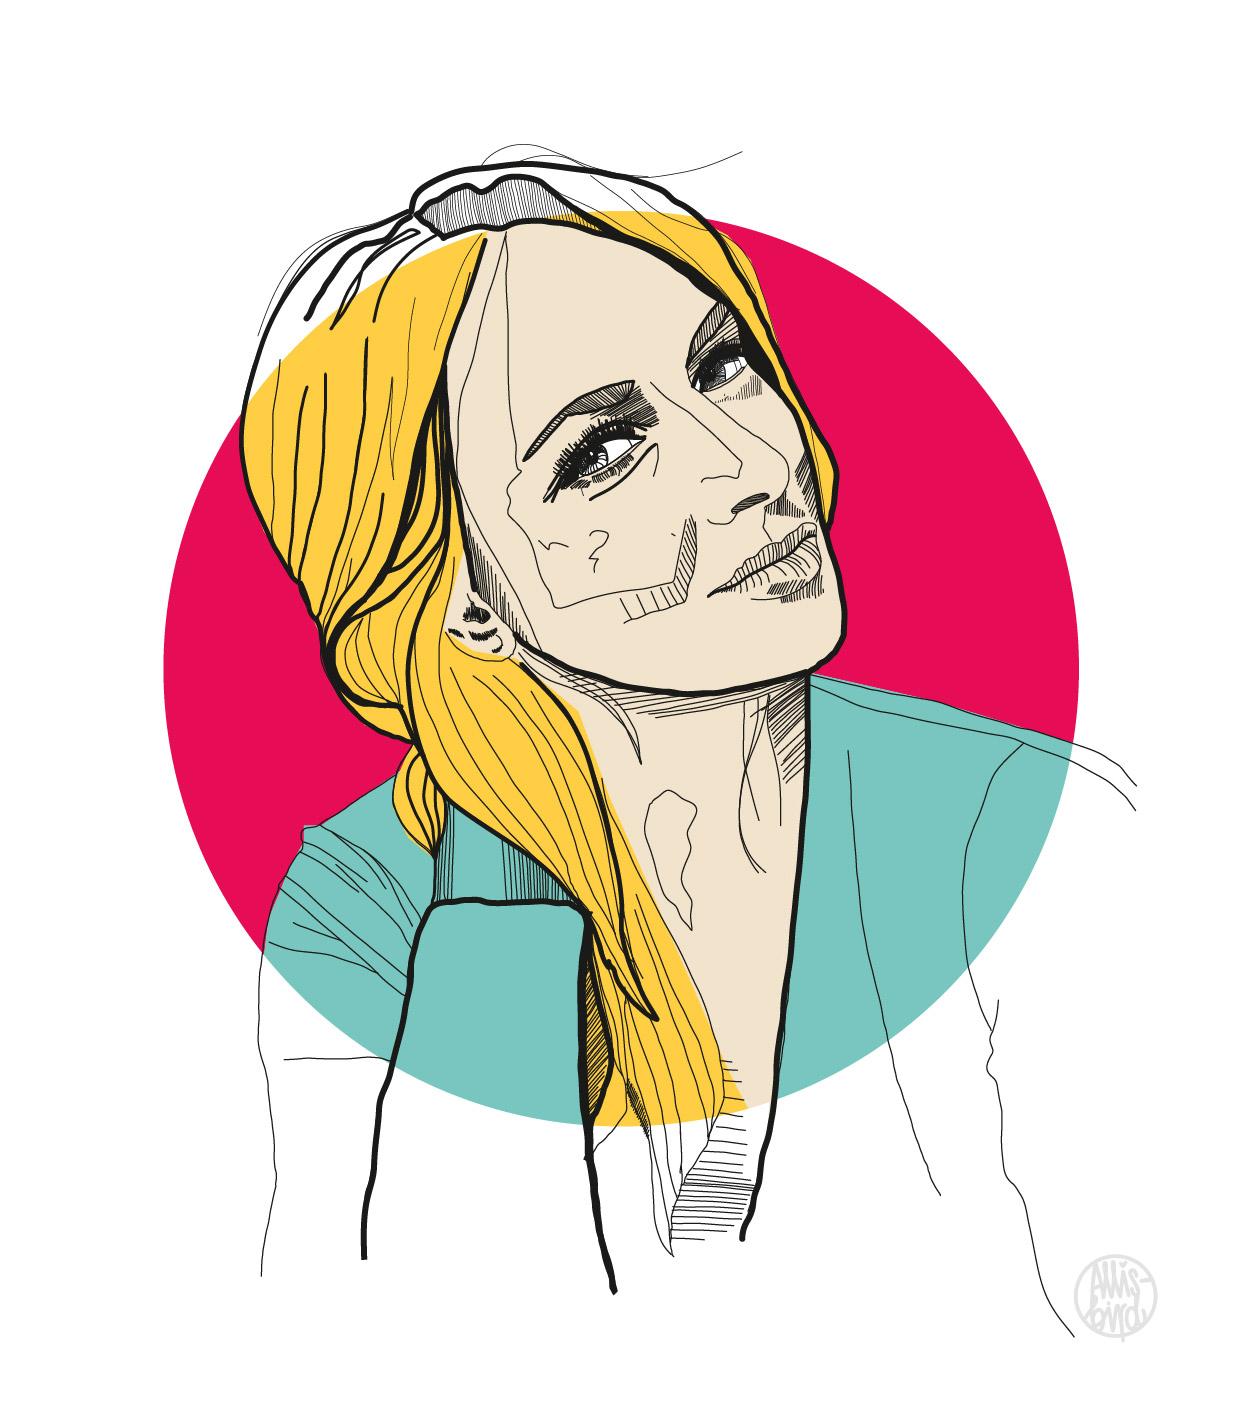 portrait-illustration-grafikdesign-susi-braun-heysister